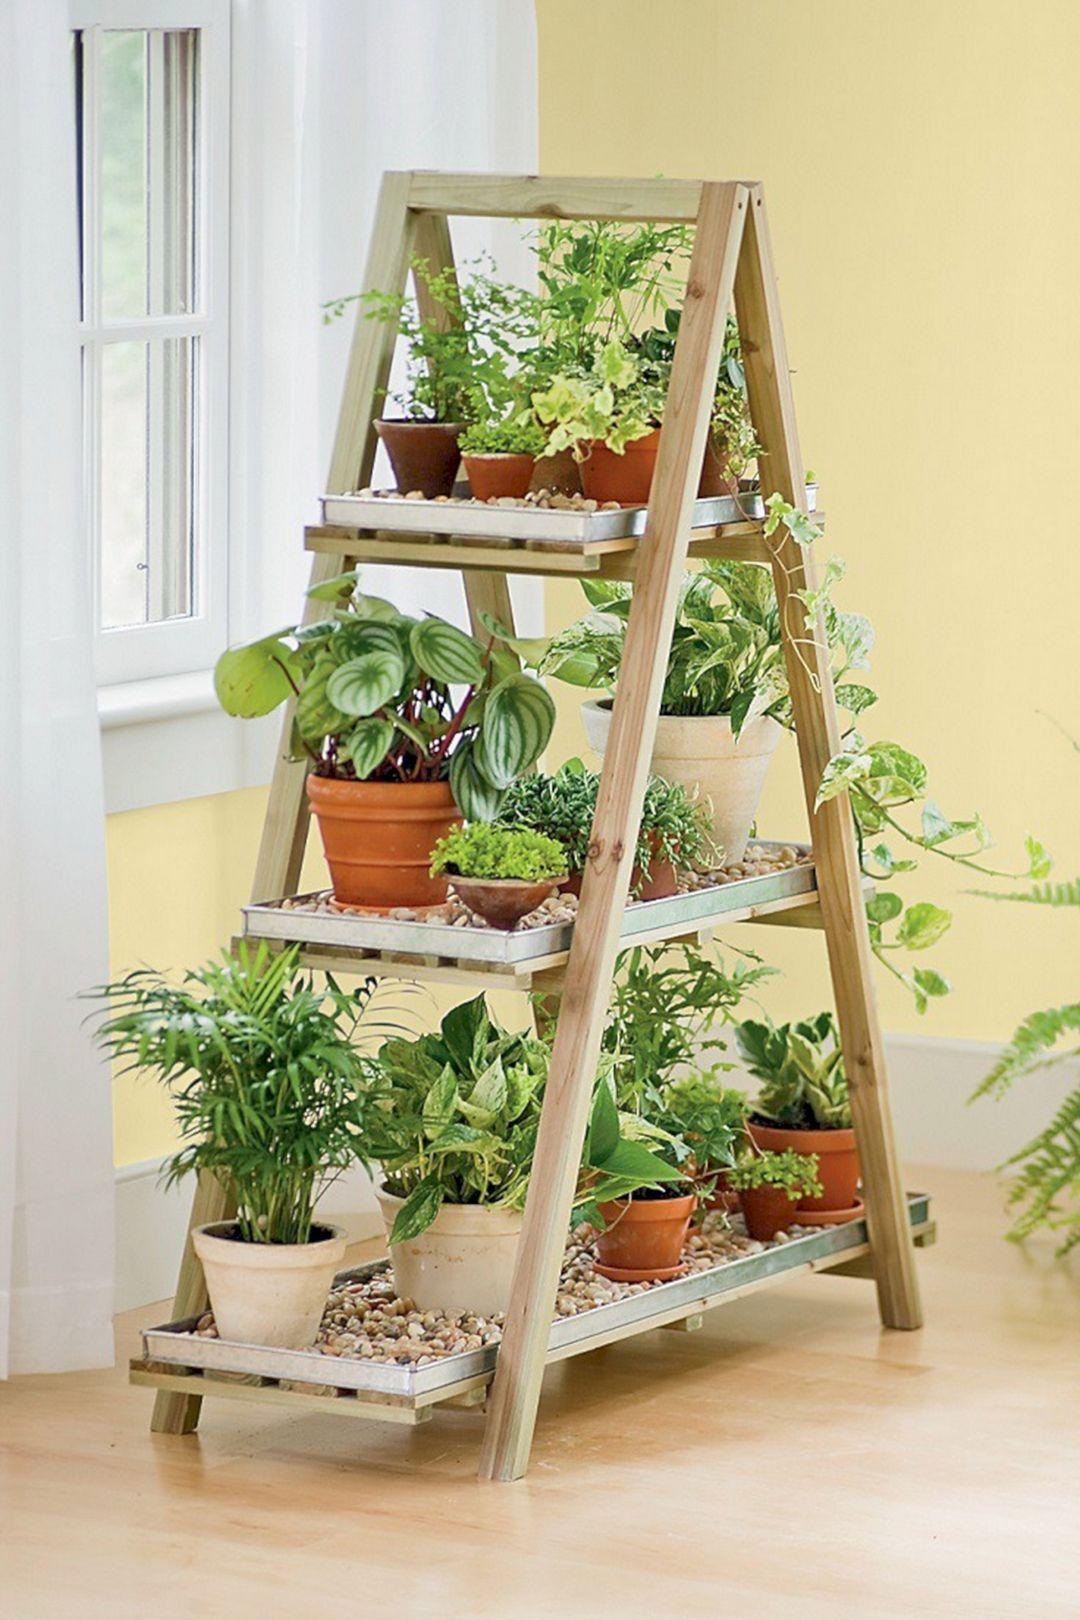 DIY Indoor Garden Ideas